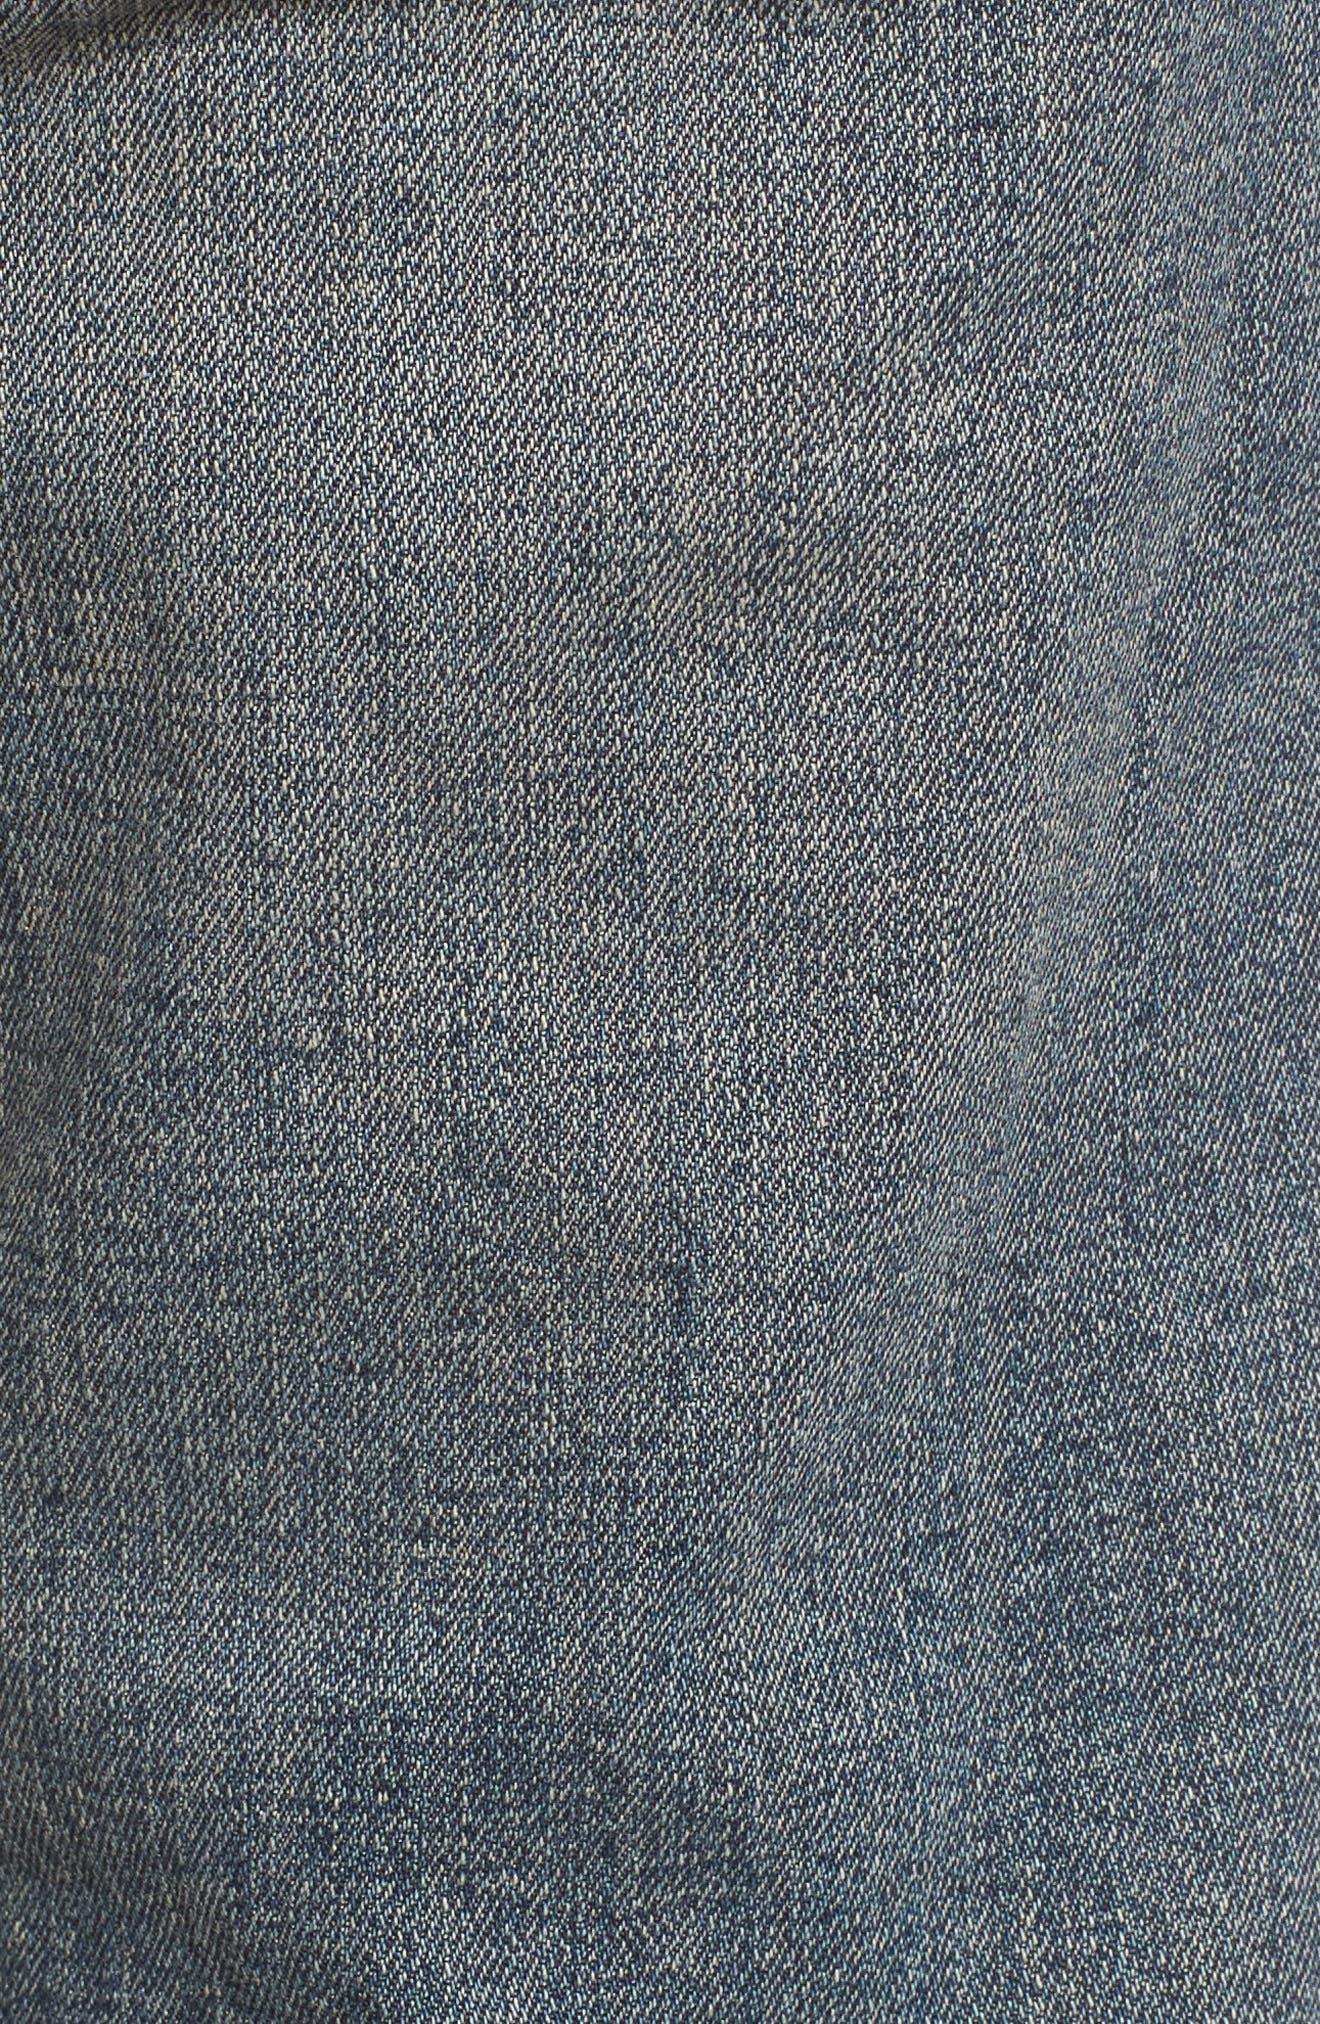 Repairer Slim Fit Denim Pants,                             Alternate thumbnail 5, color,                             Rockstar Blue